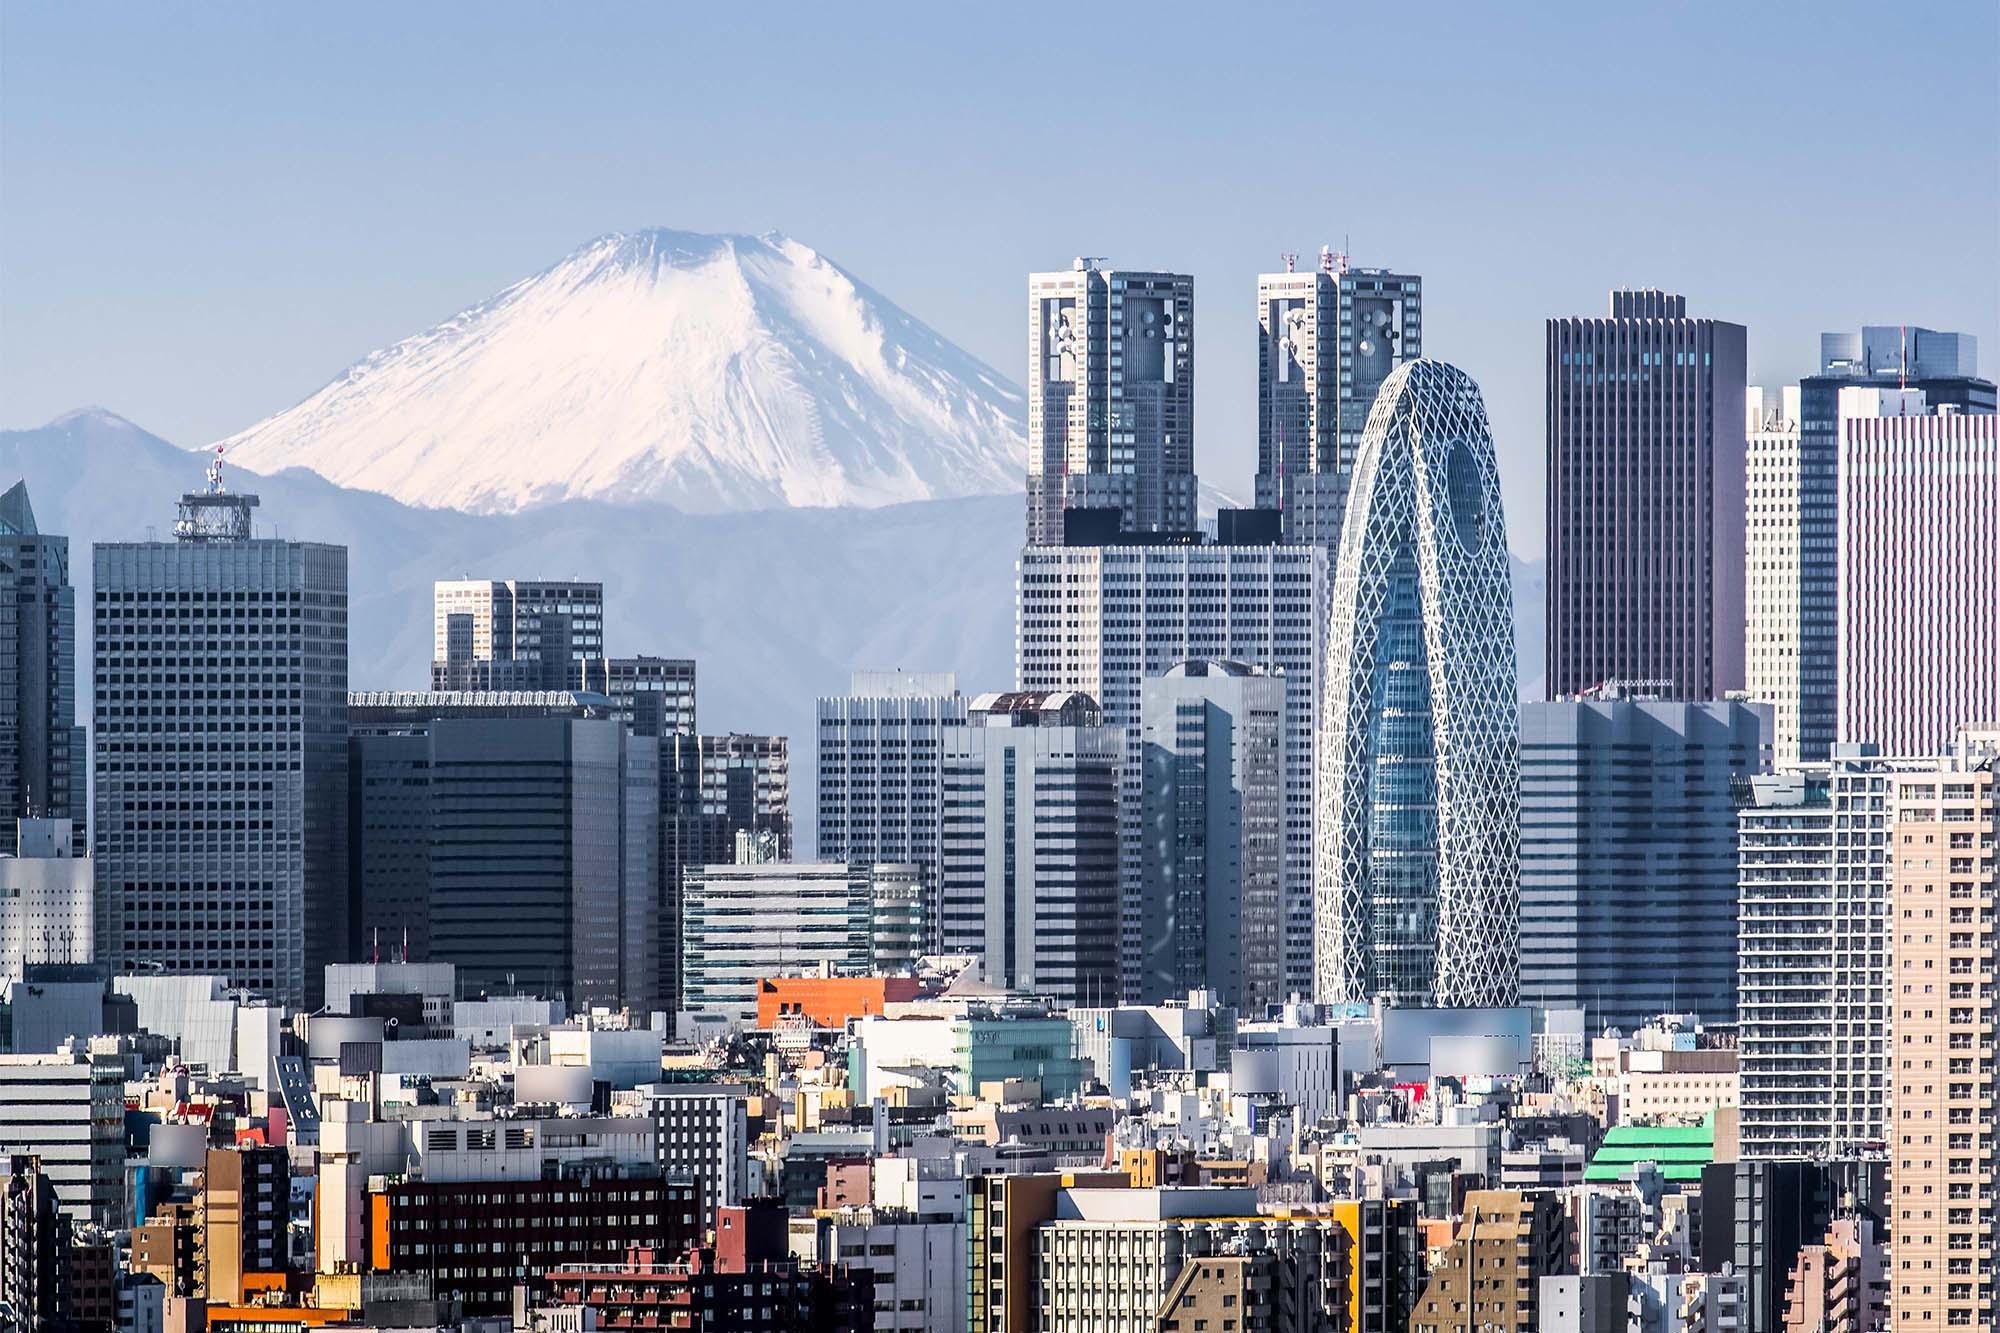 Tokyo skyline with Mt. Fuji